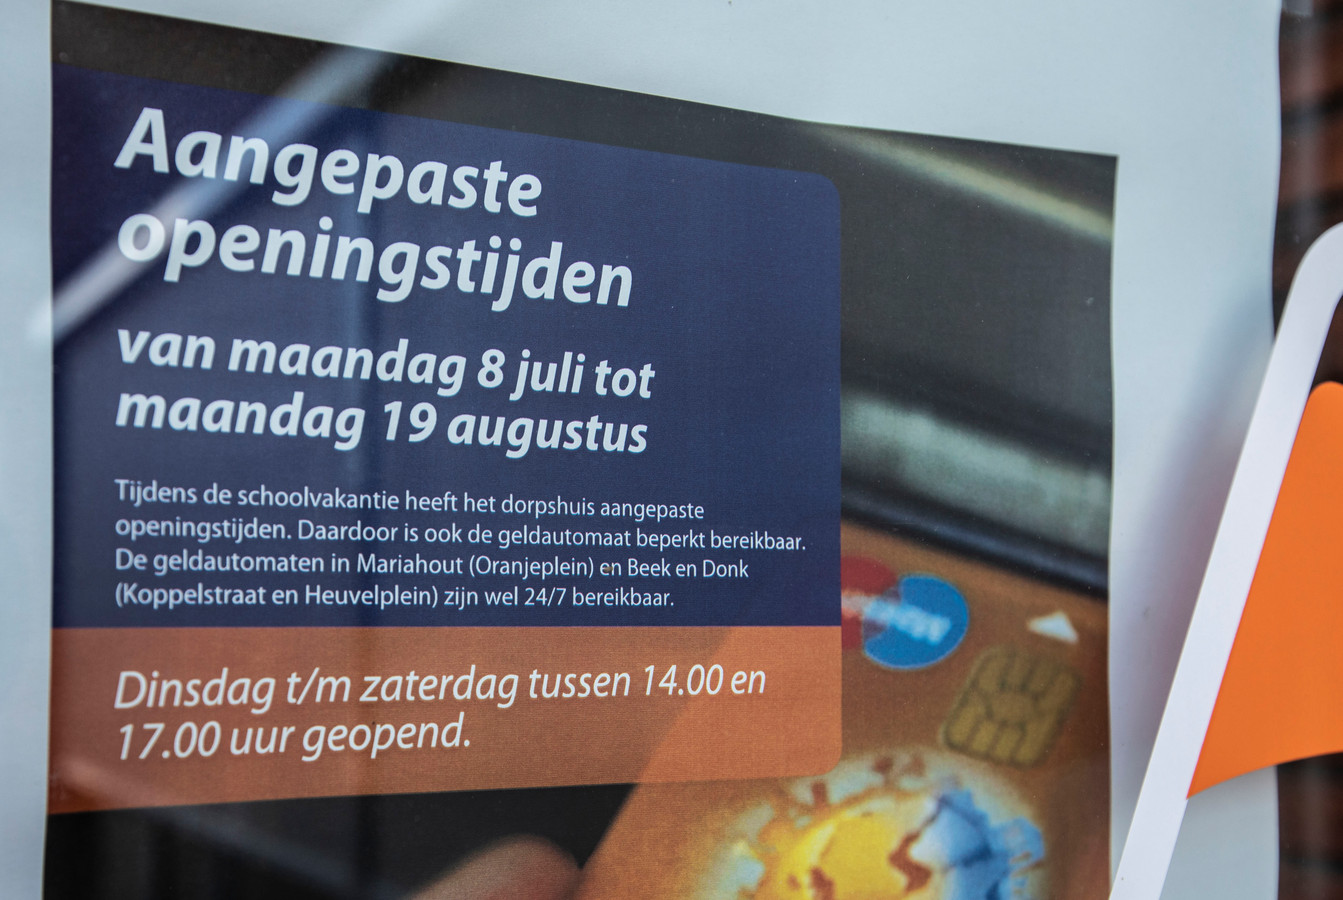 Problemen met bereikbaarheid van pinautomaat in dorpshuis Lieshout